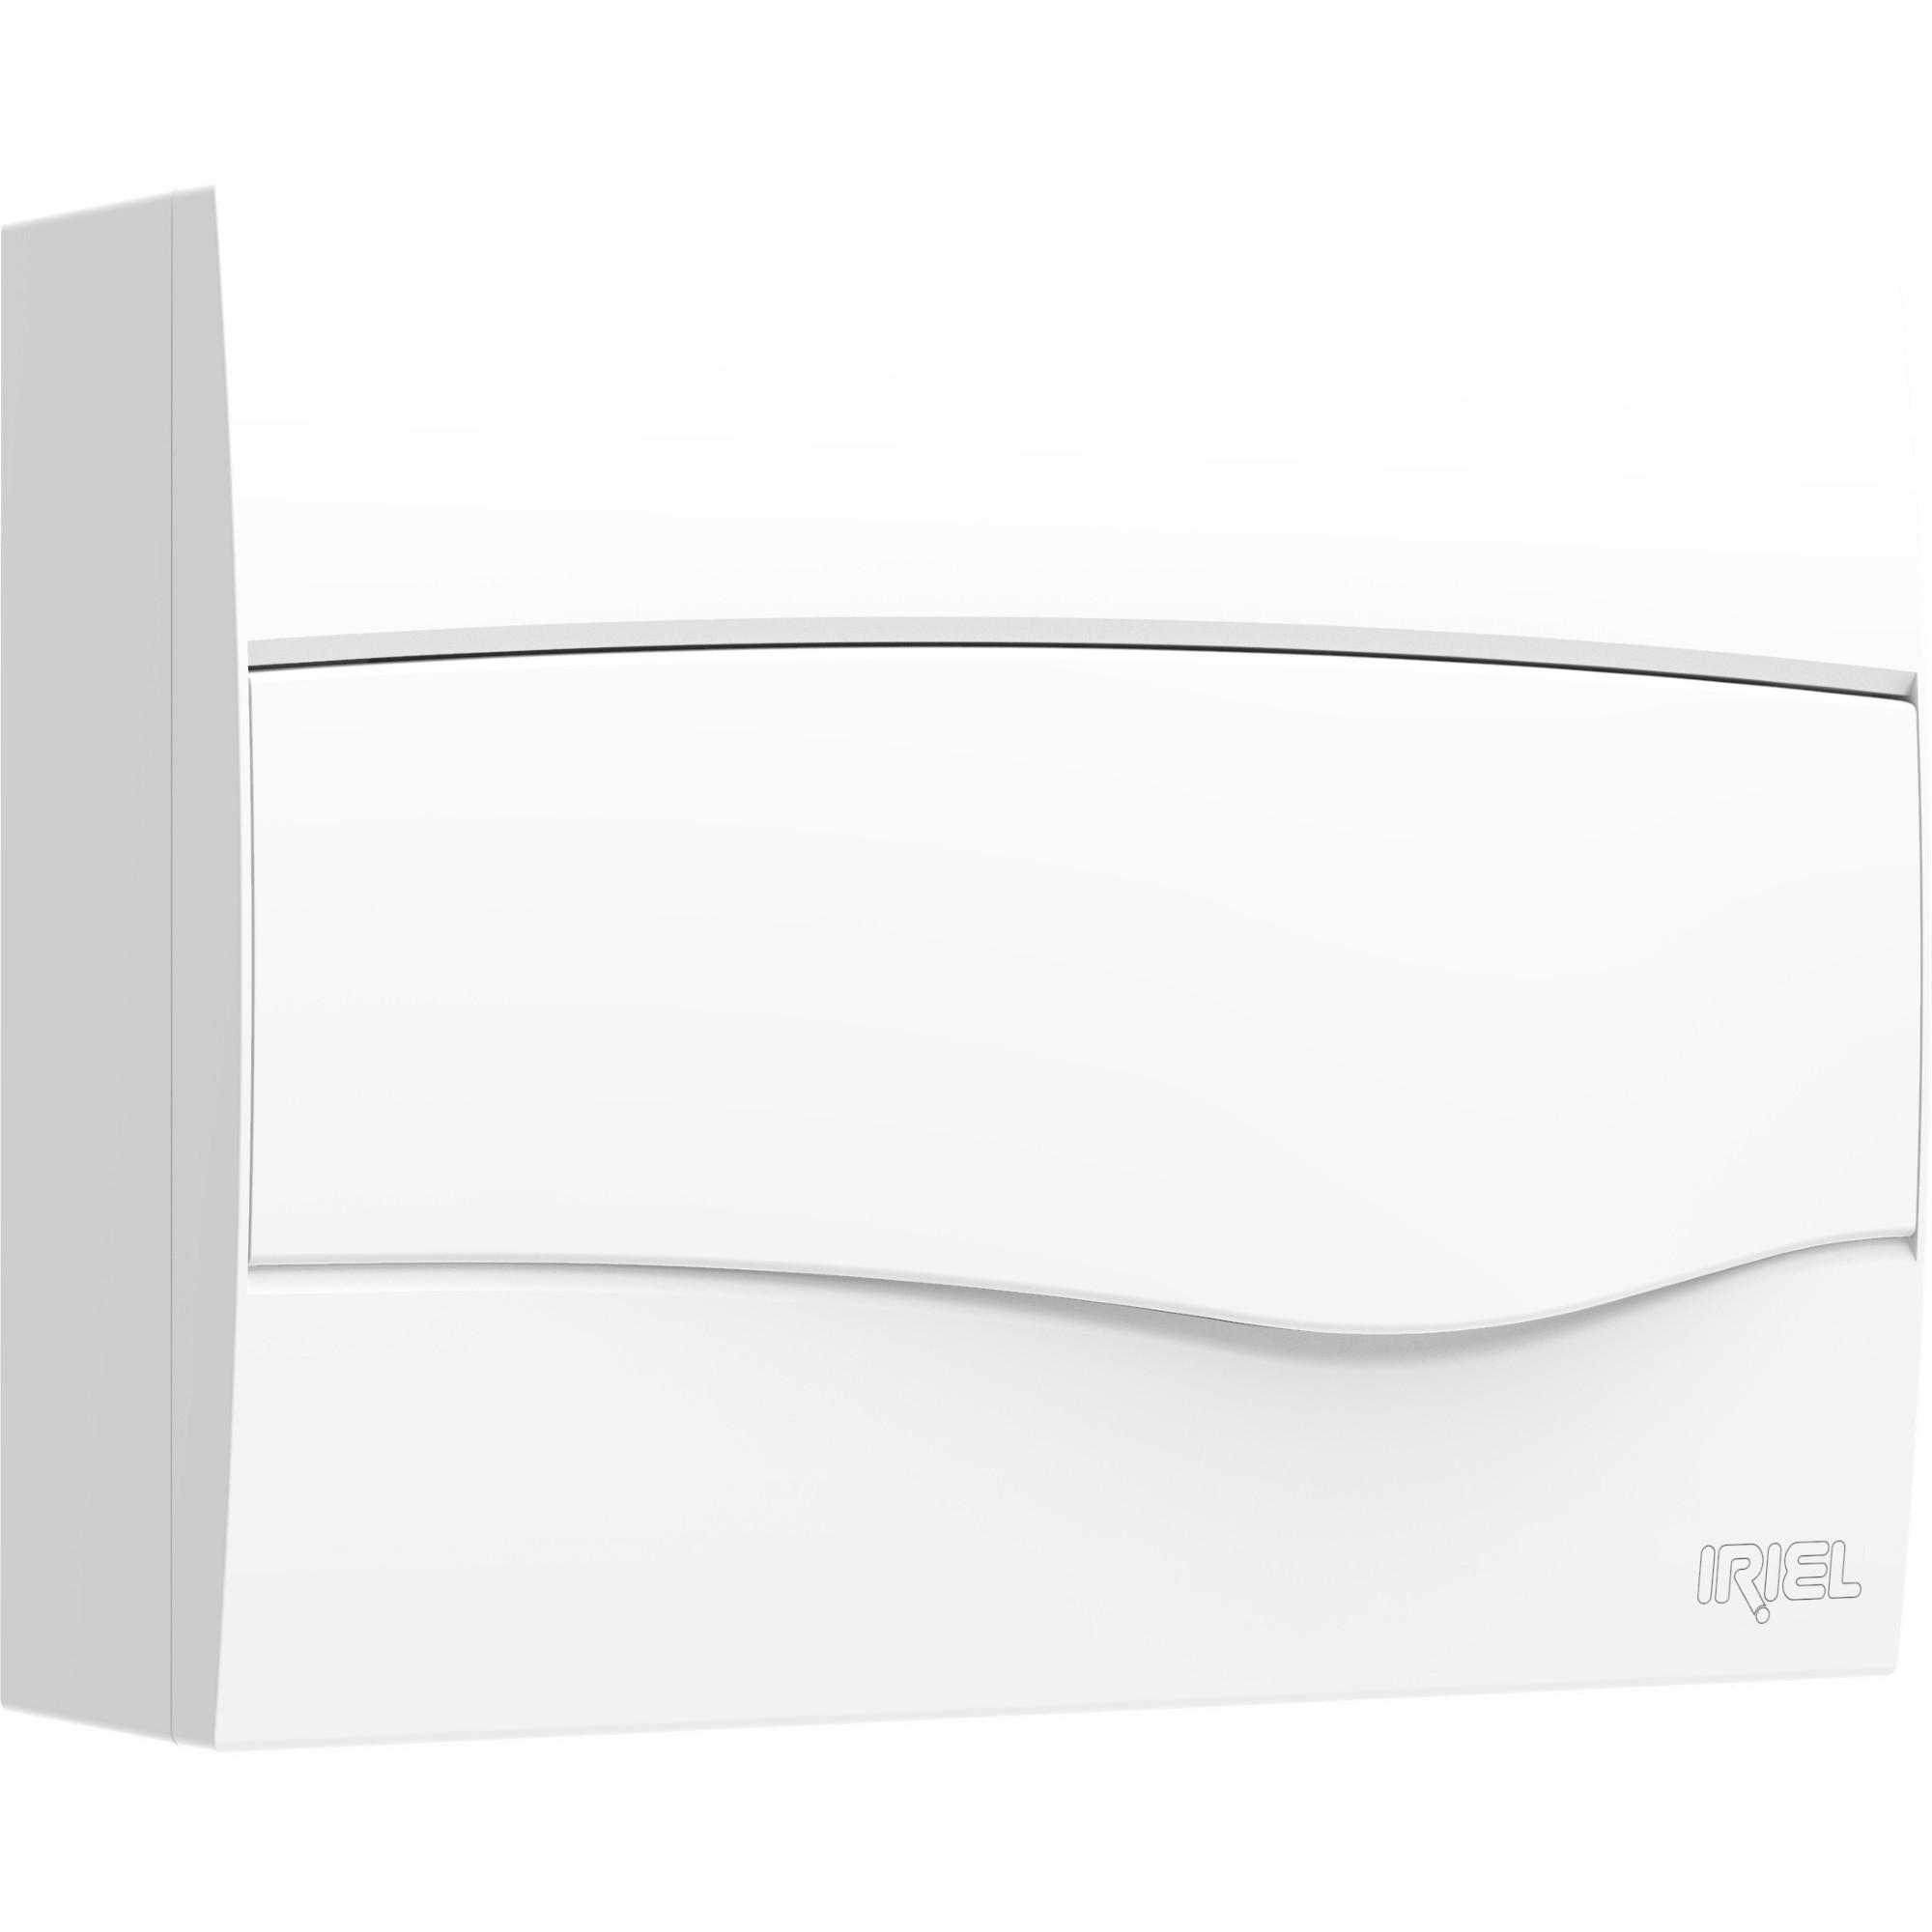 Quadro de Distribuicao Iriel Universal Sobrepor 52x34x52cm para 12 Disjuntores Branco - 8GB0 122-0MB - Siemens